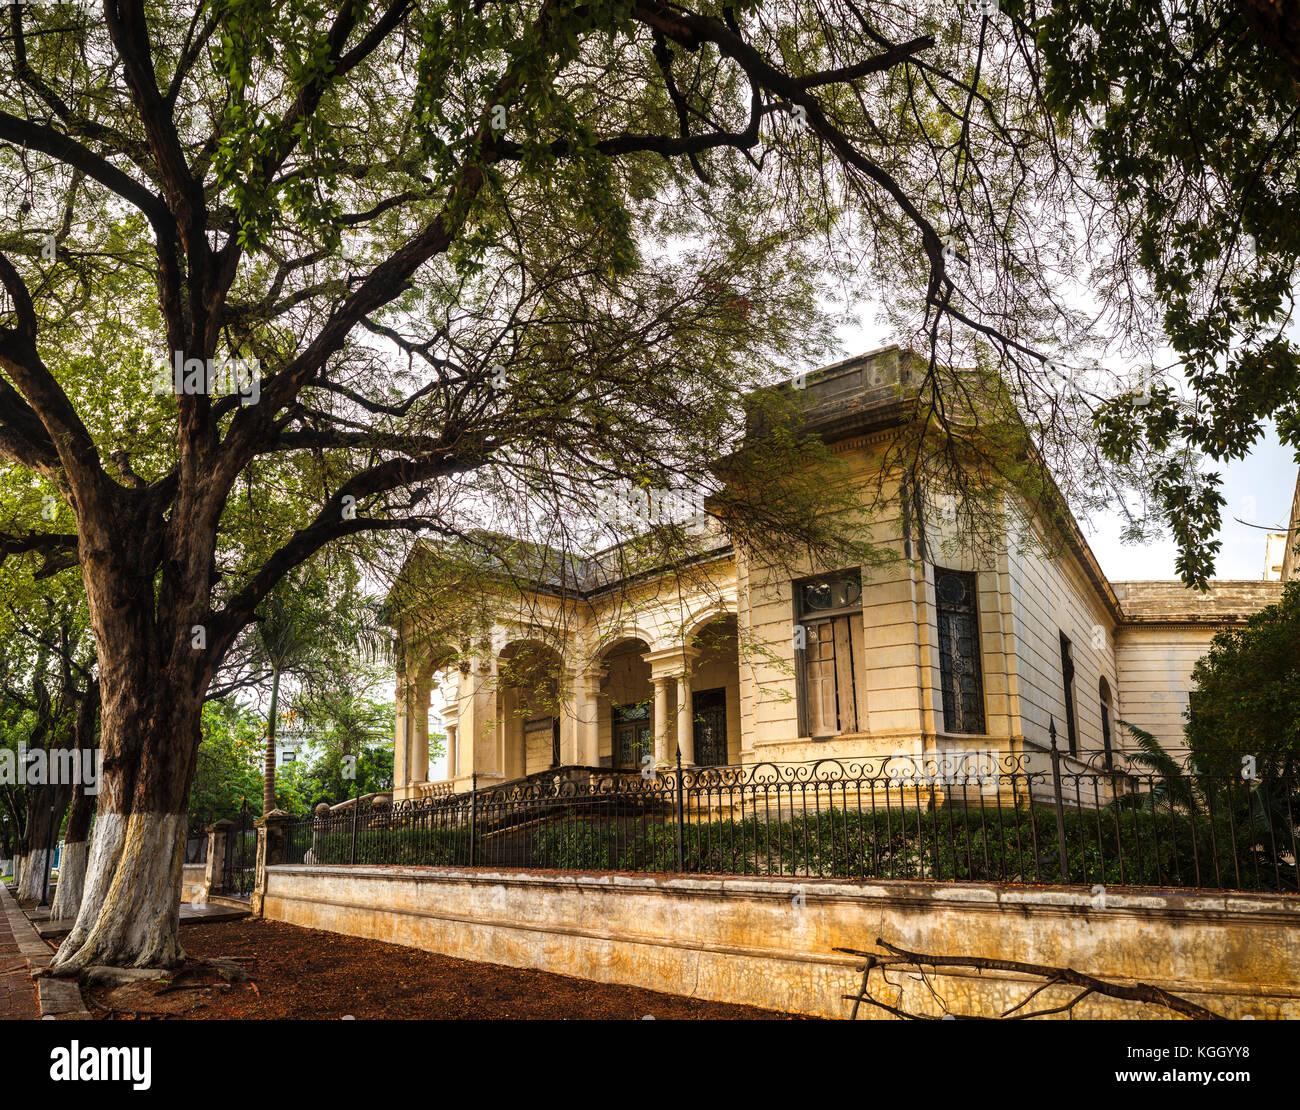 Casa Molina Duarte, Mérida, Yucatán, México Stock Photo